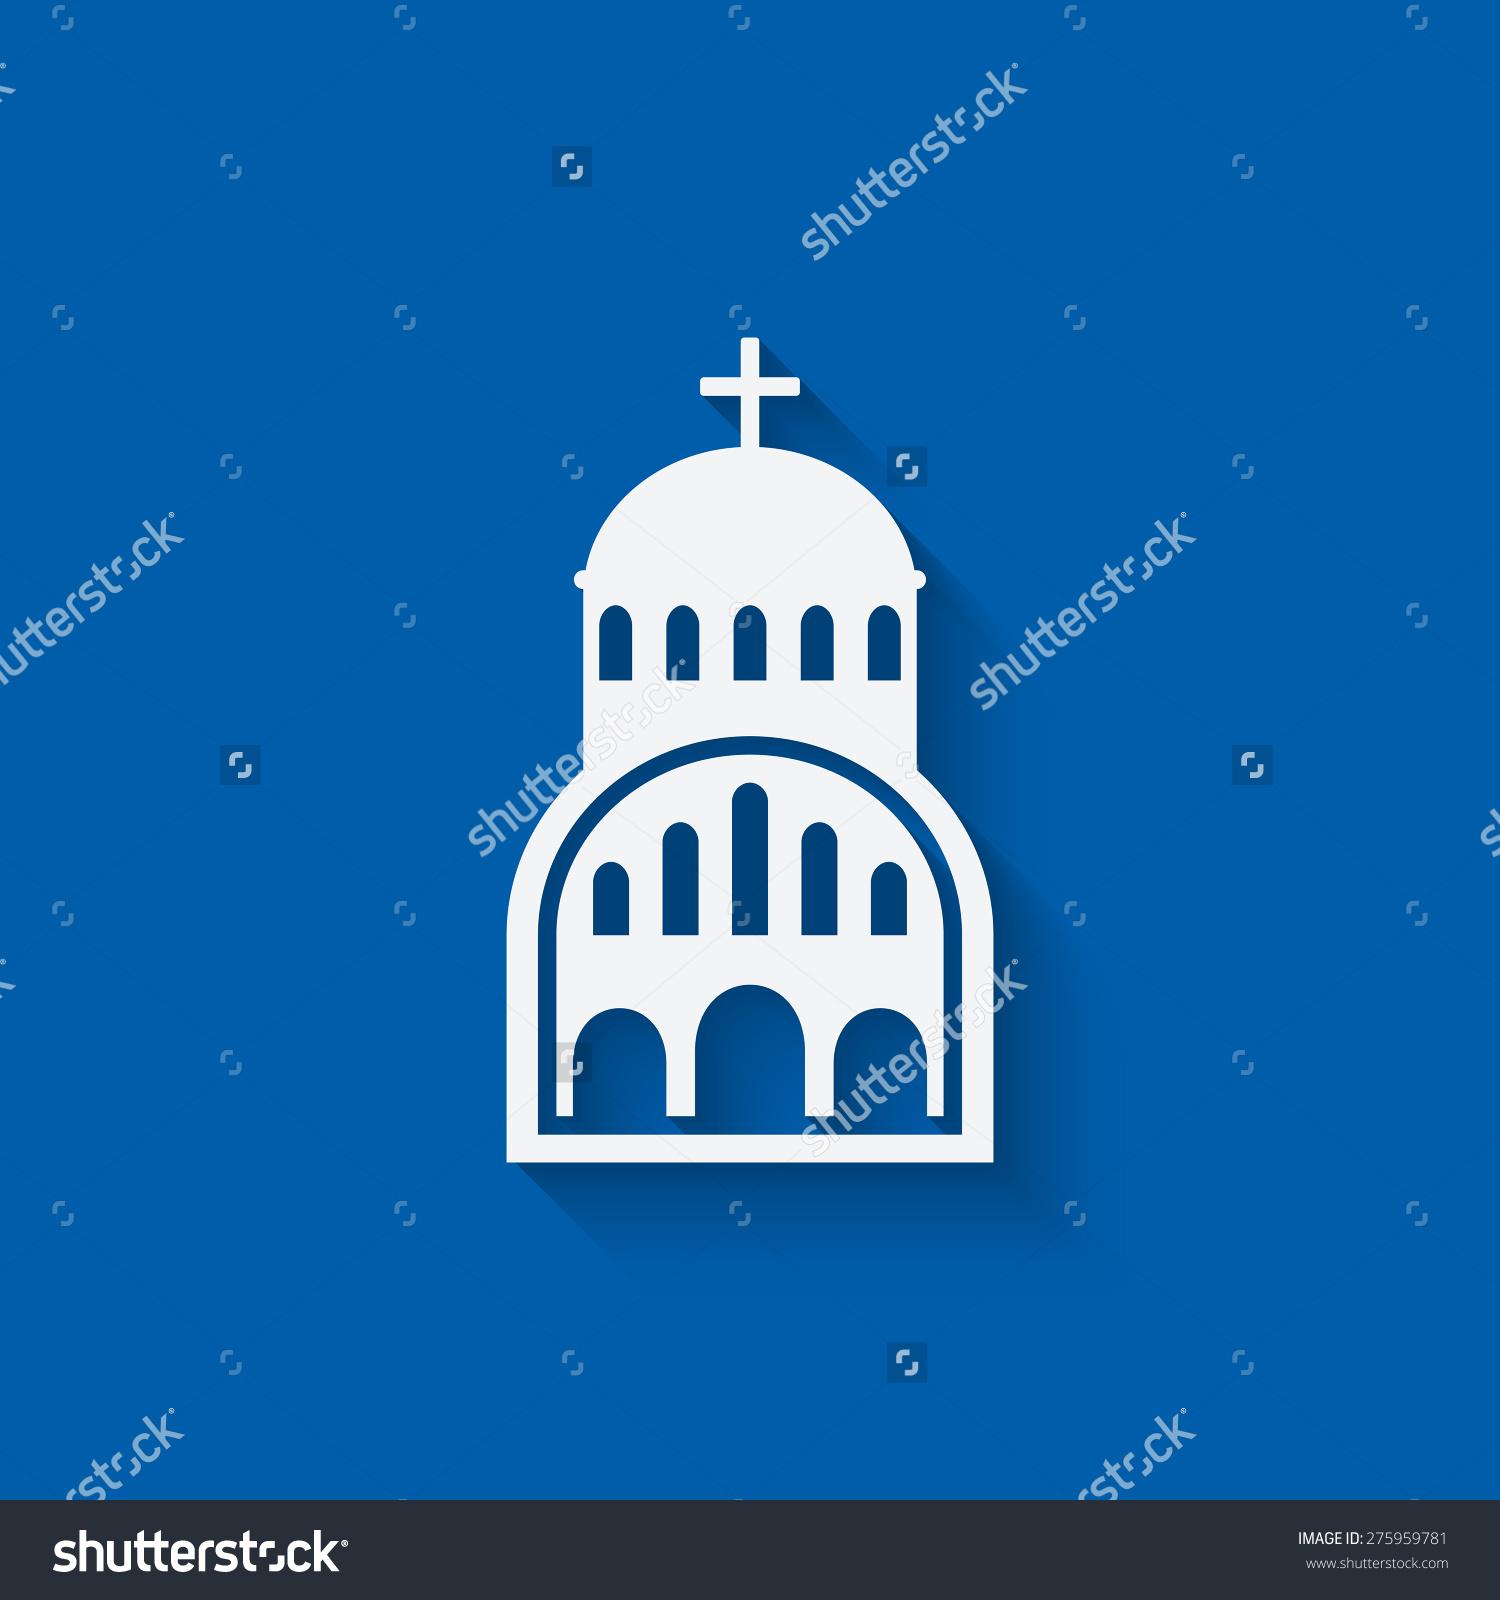 Greek Church Symbol On Blue Background Stock Vector 275959781.